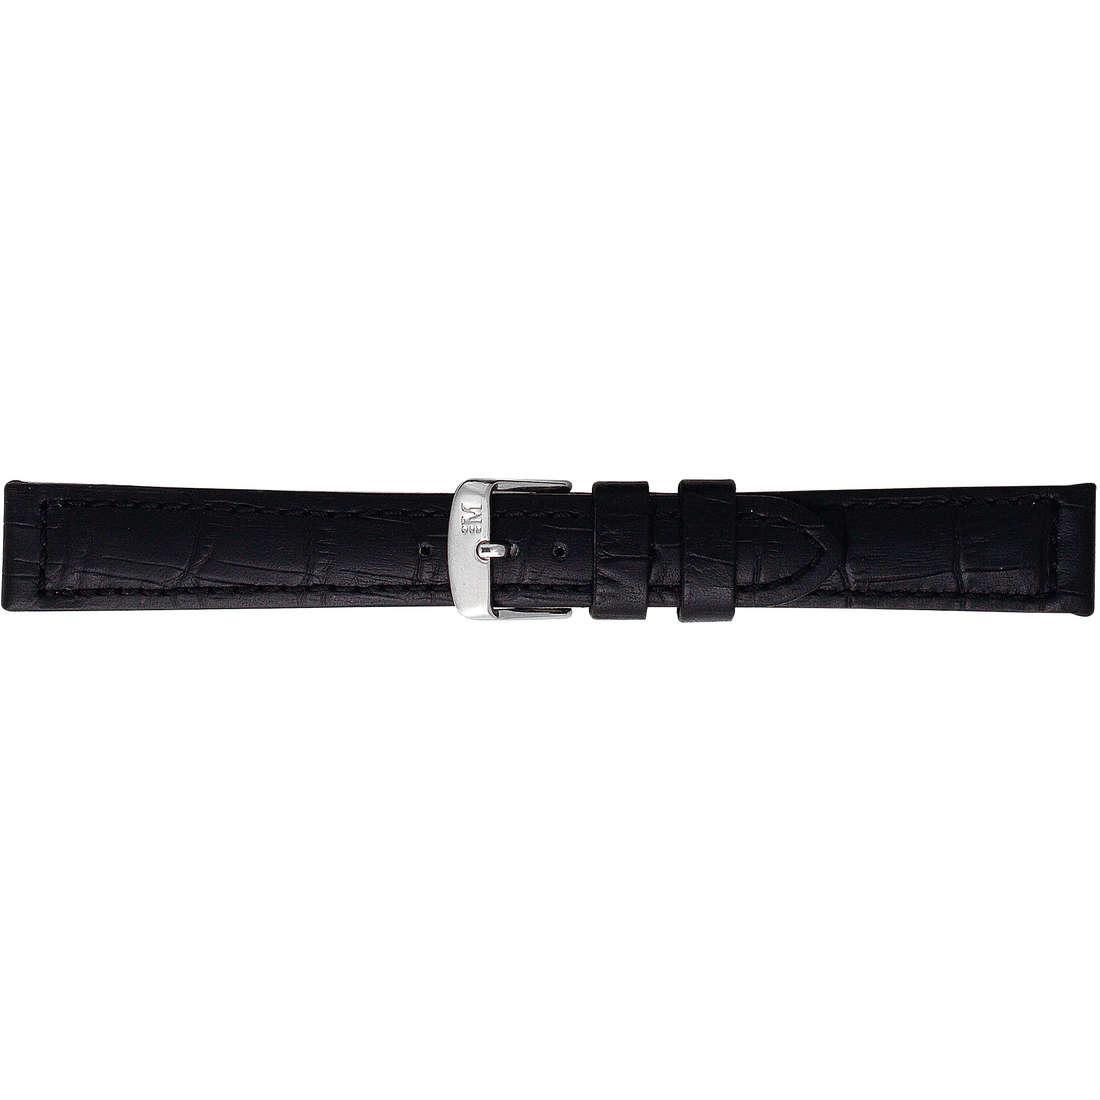 watch watch bands watch straps man Morellato Manufatti A01U2226480019CR22